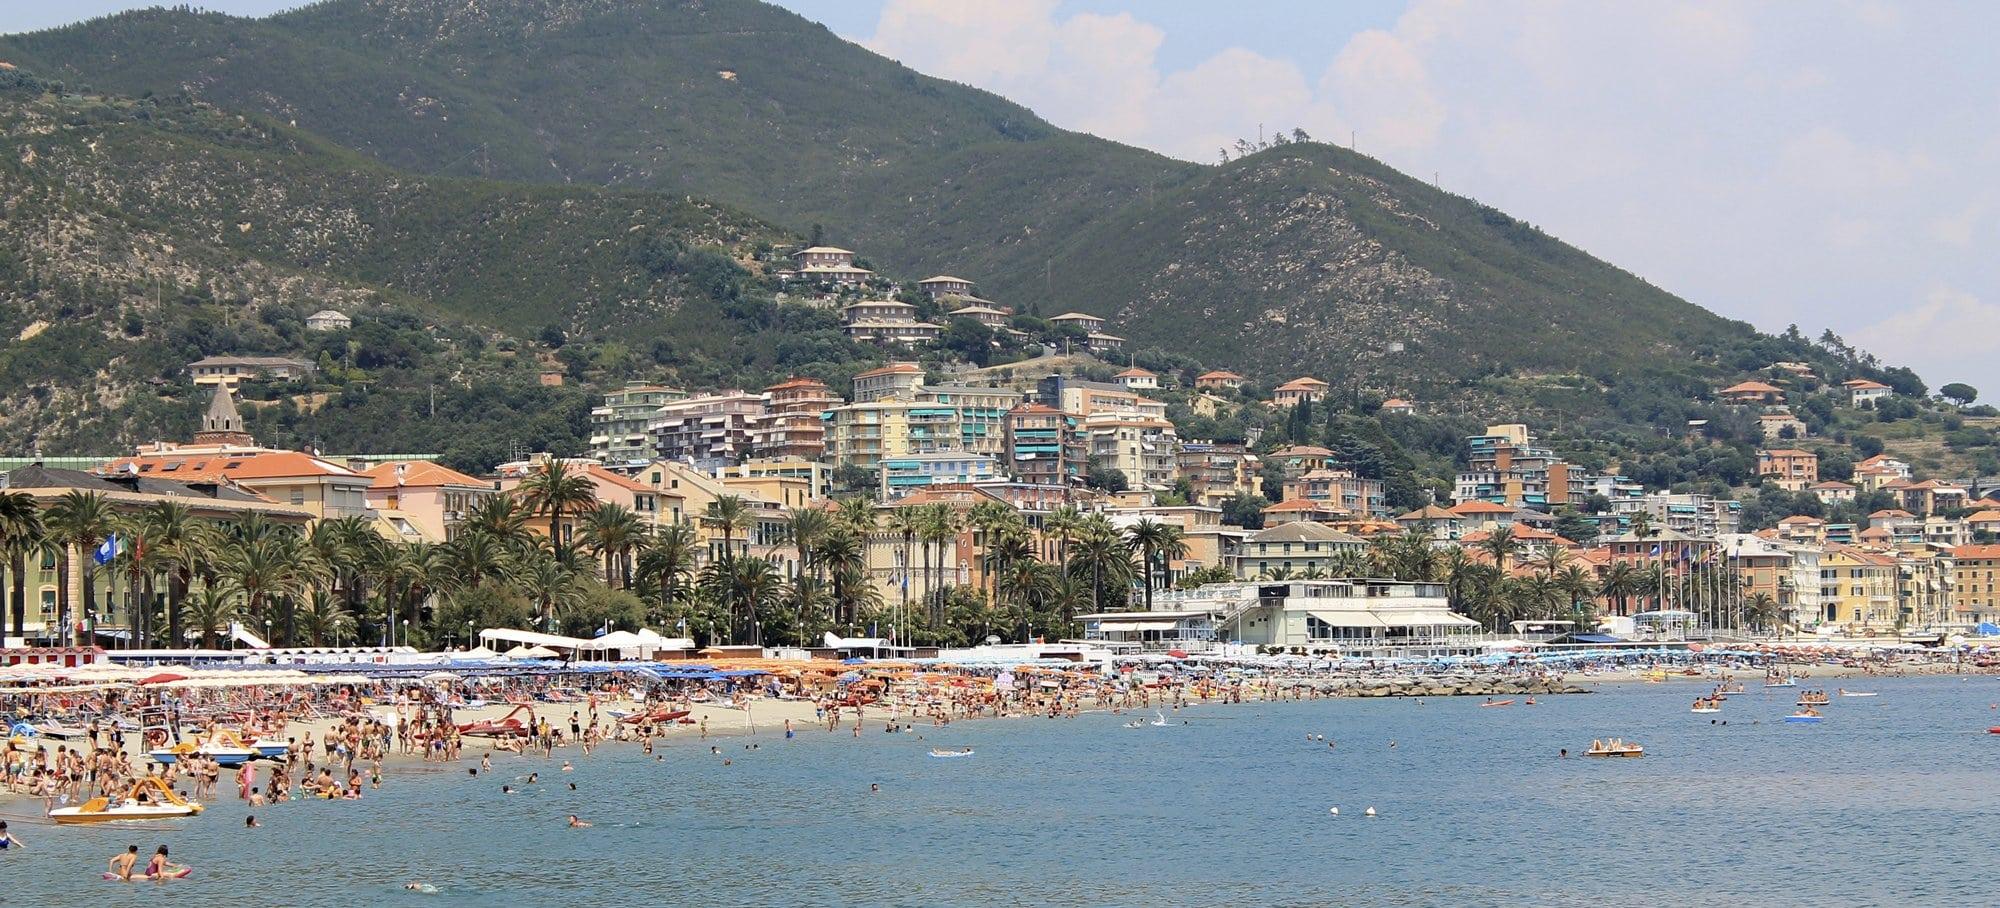 Stabilimenti balneari   Varazze Turismo